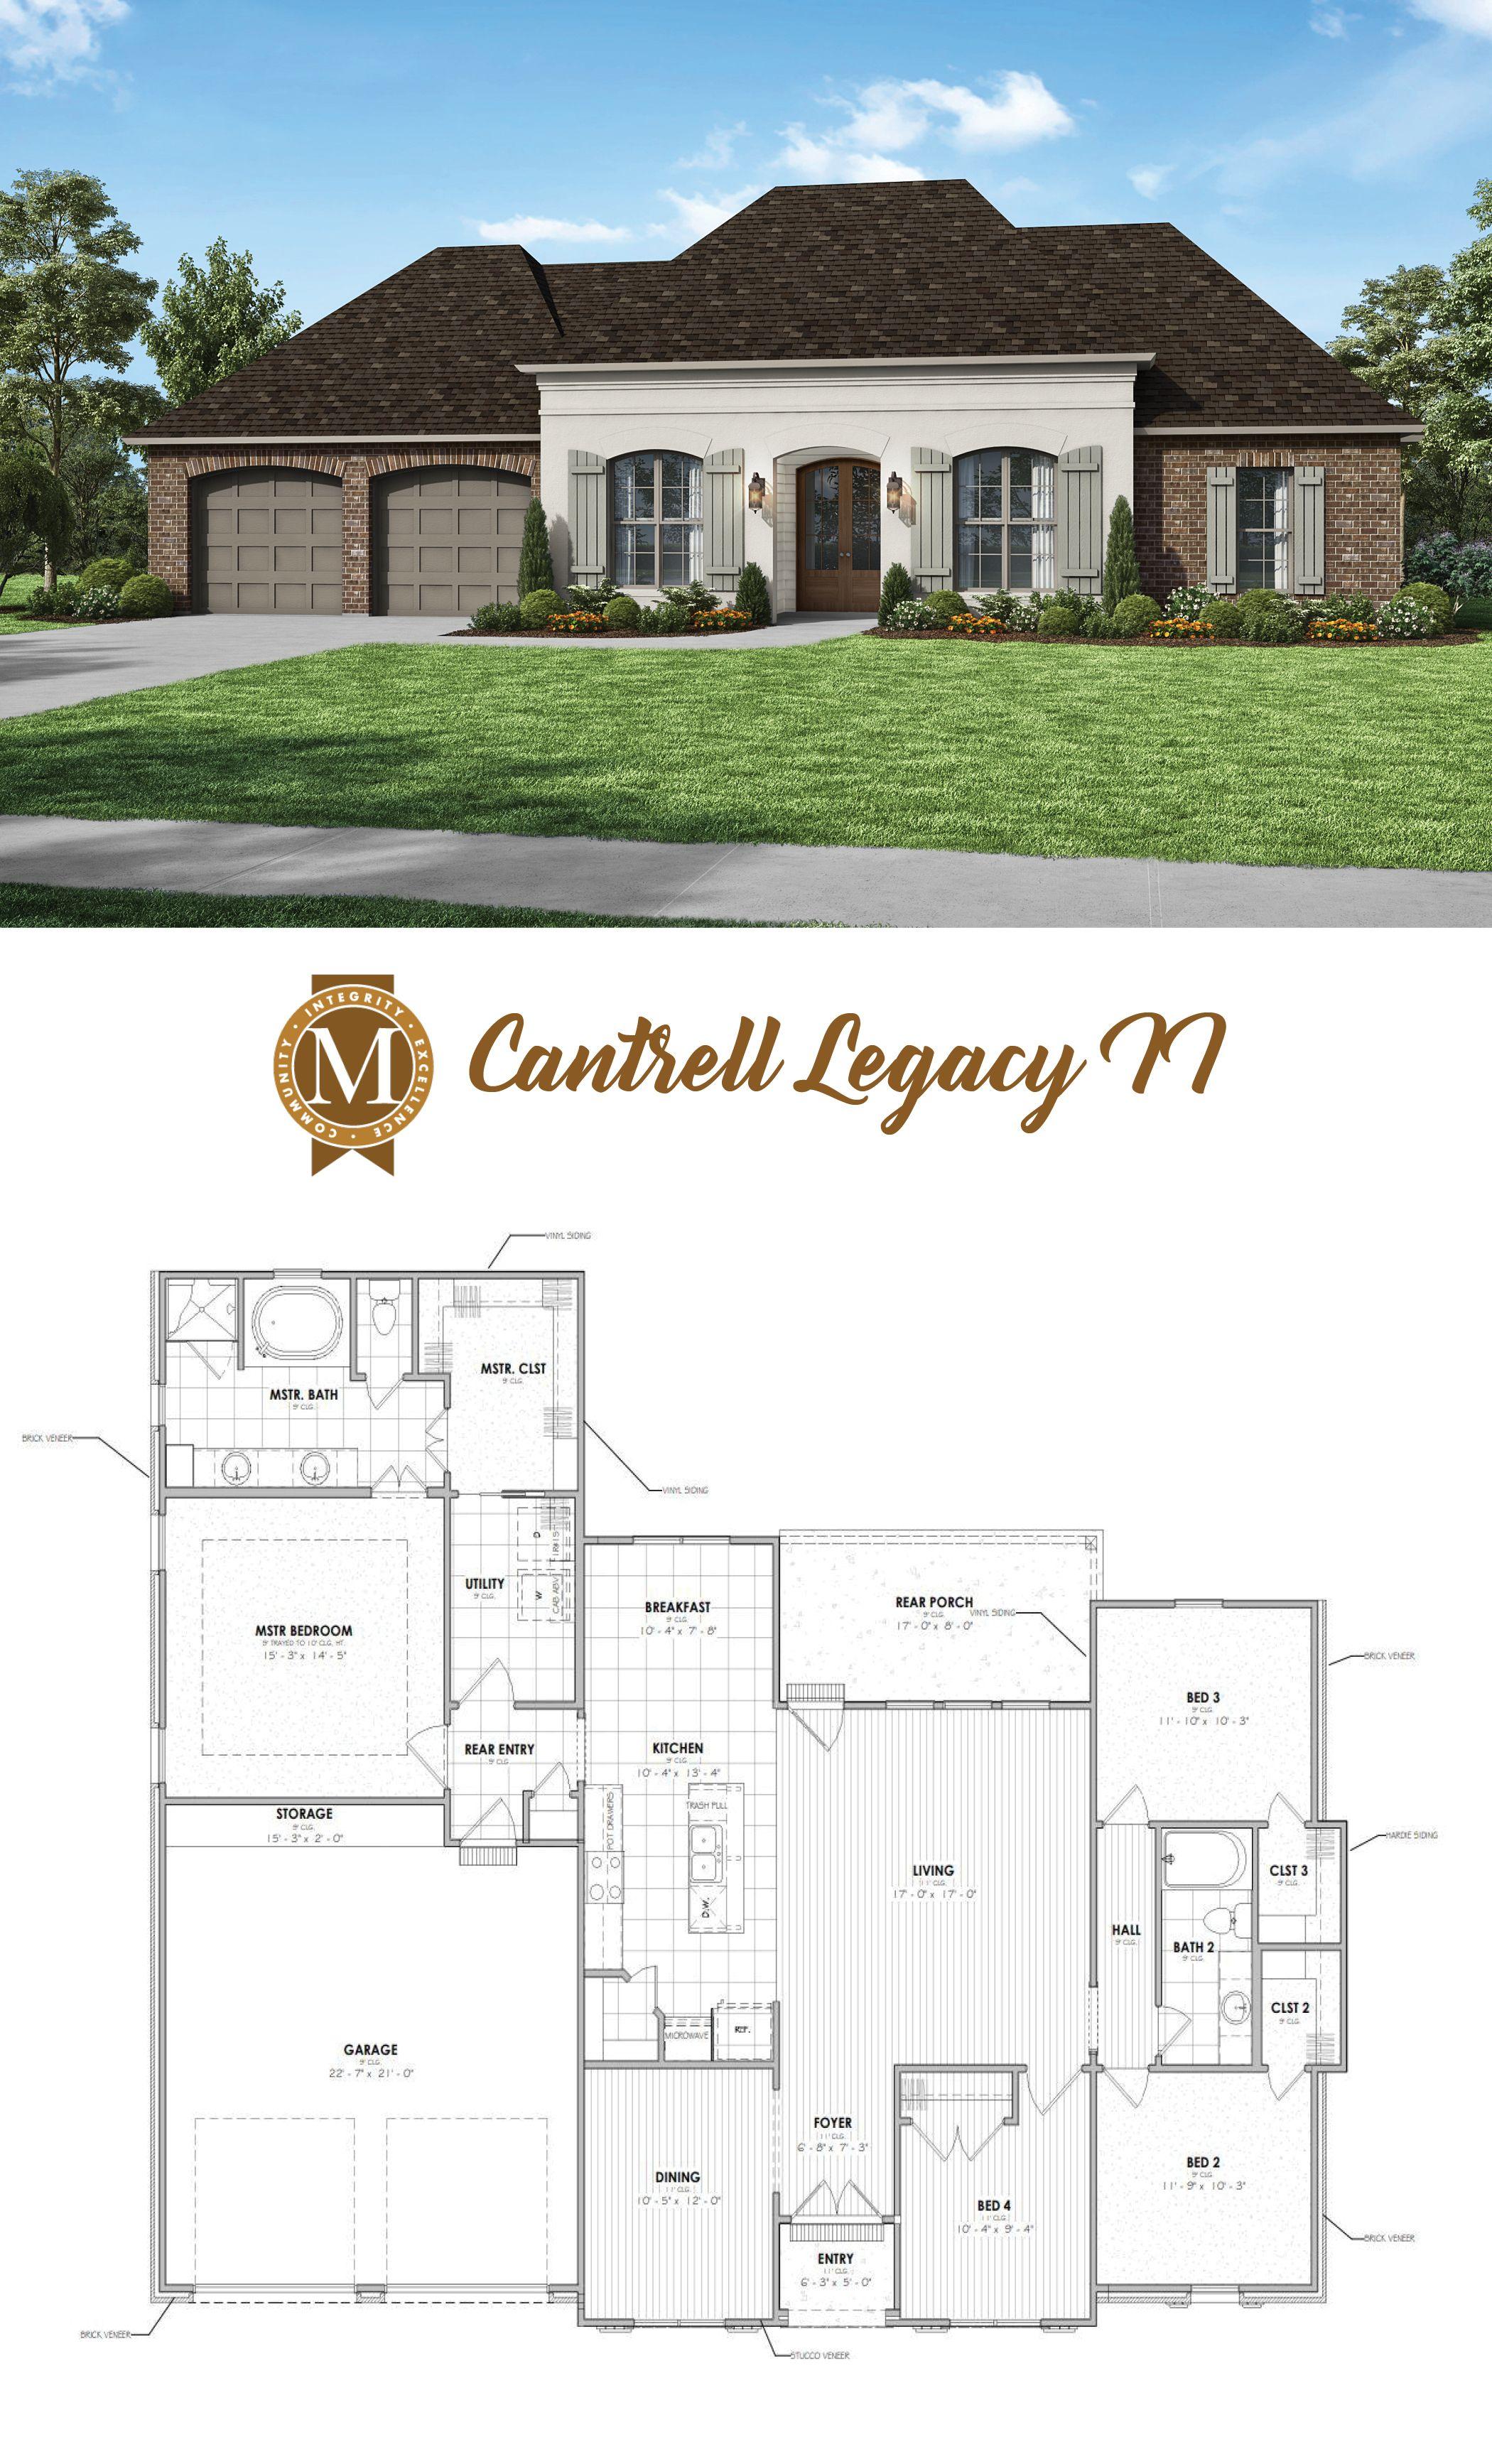 Cantrell Legacy Ii Floor Plan Luxury House Plans New House Plans Architectural House Plans